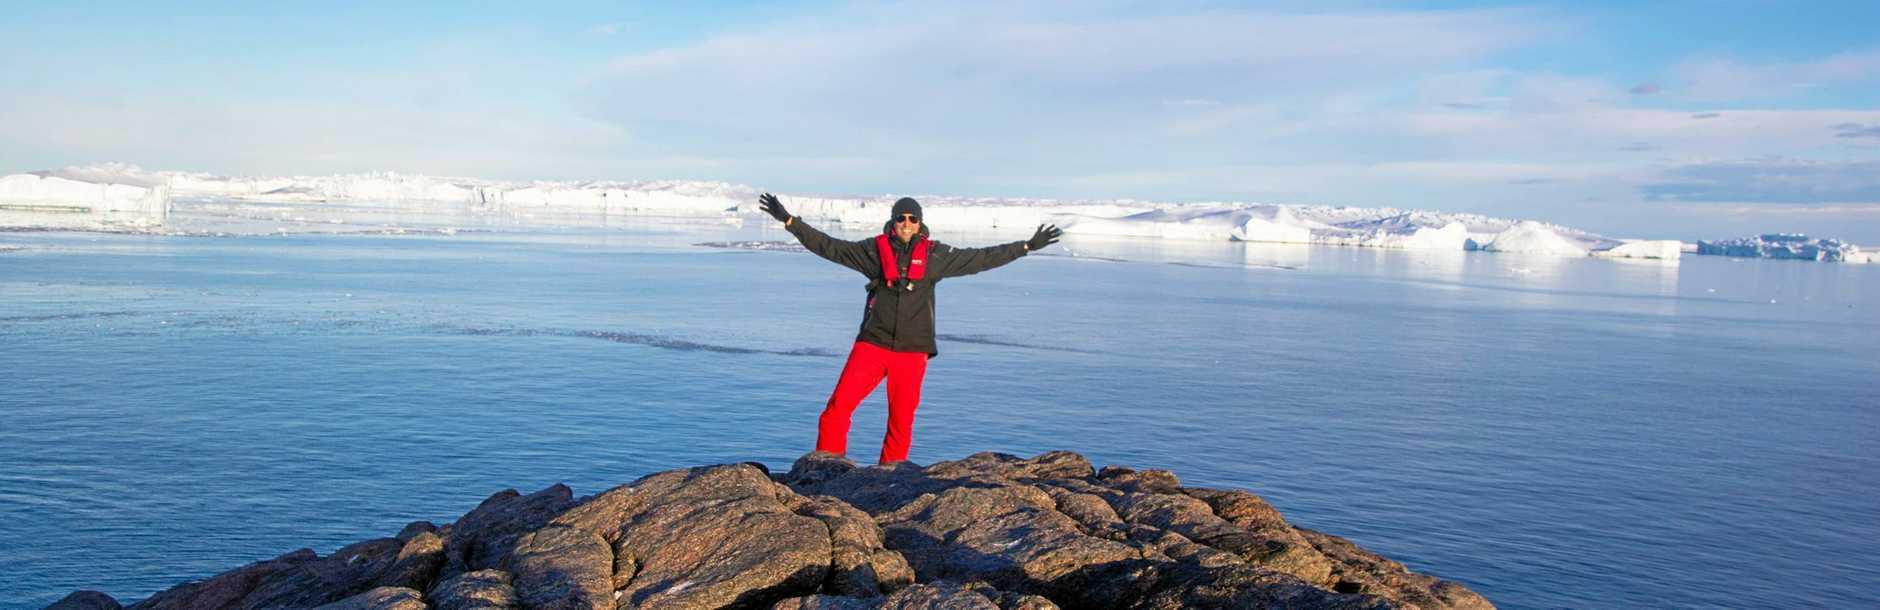 Chad Carey in Antarctica.